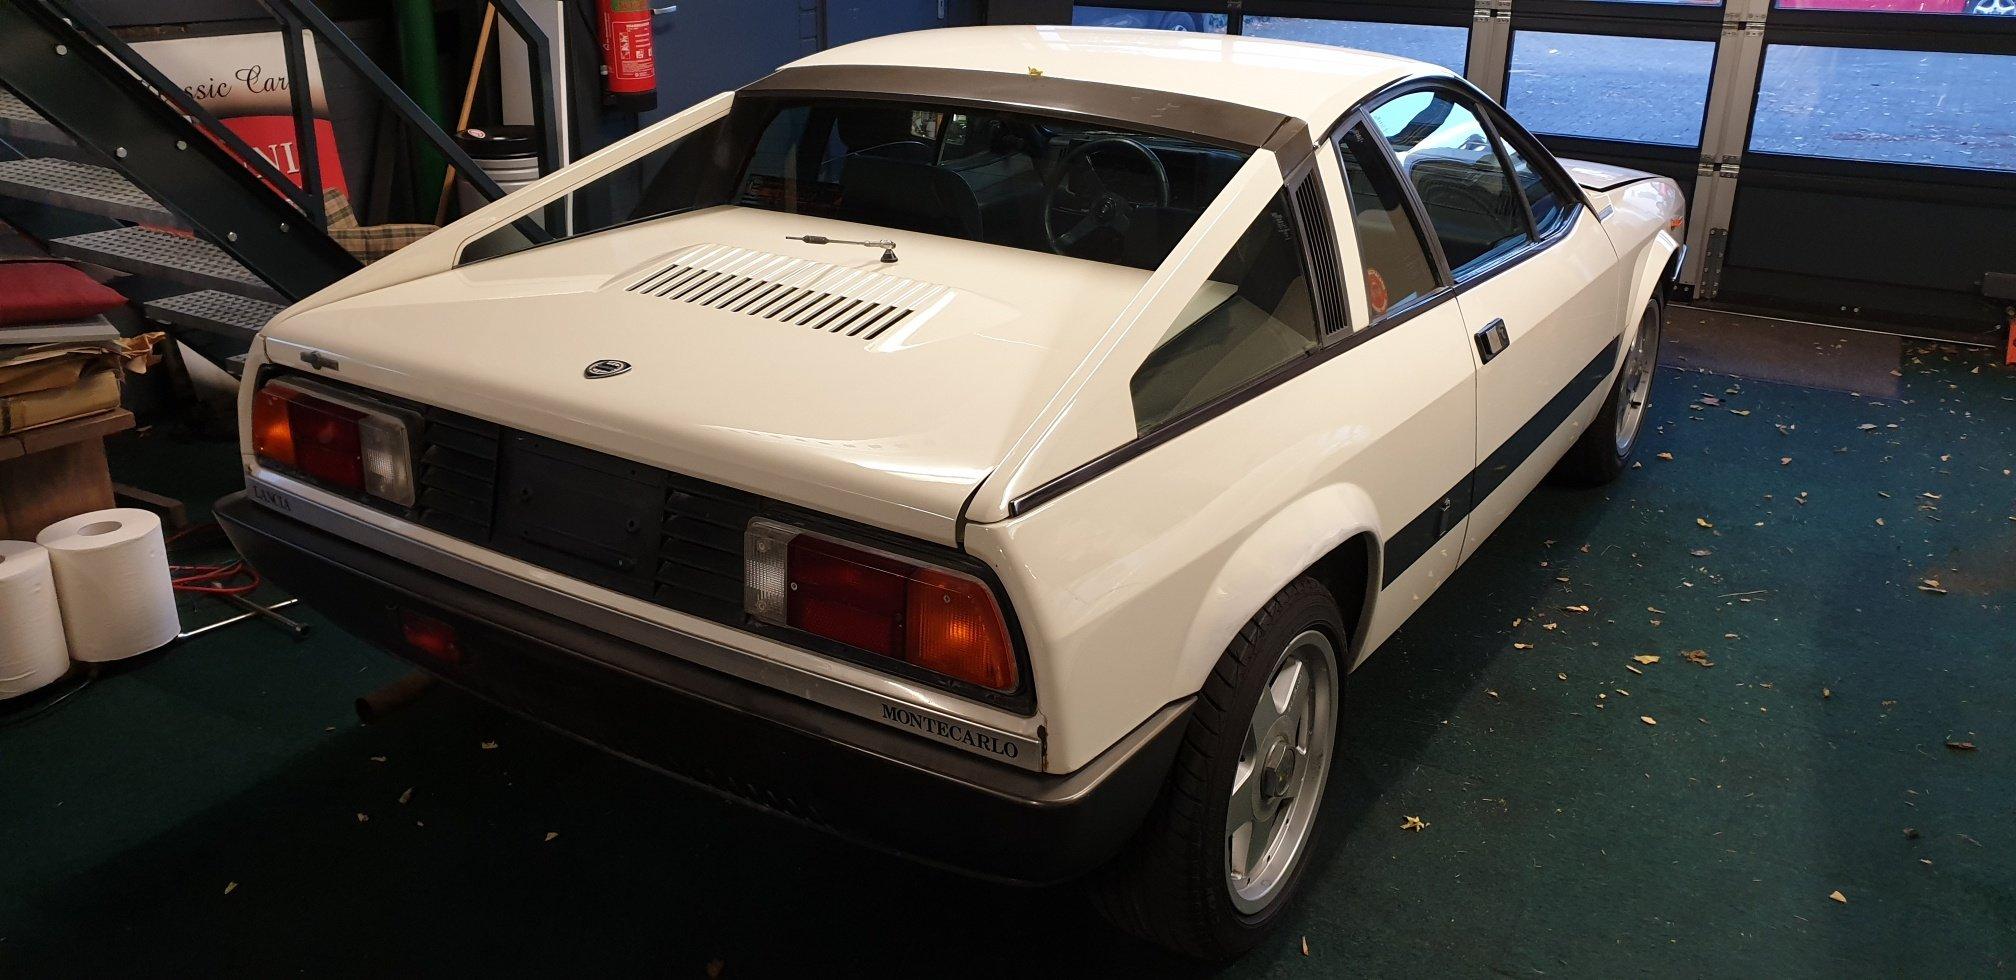 Lancia Beta Monte Carlo Coupe 1982 For Sale (picture 6 of 6)